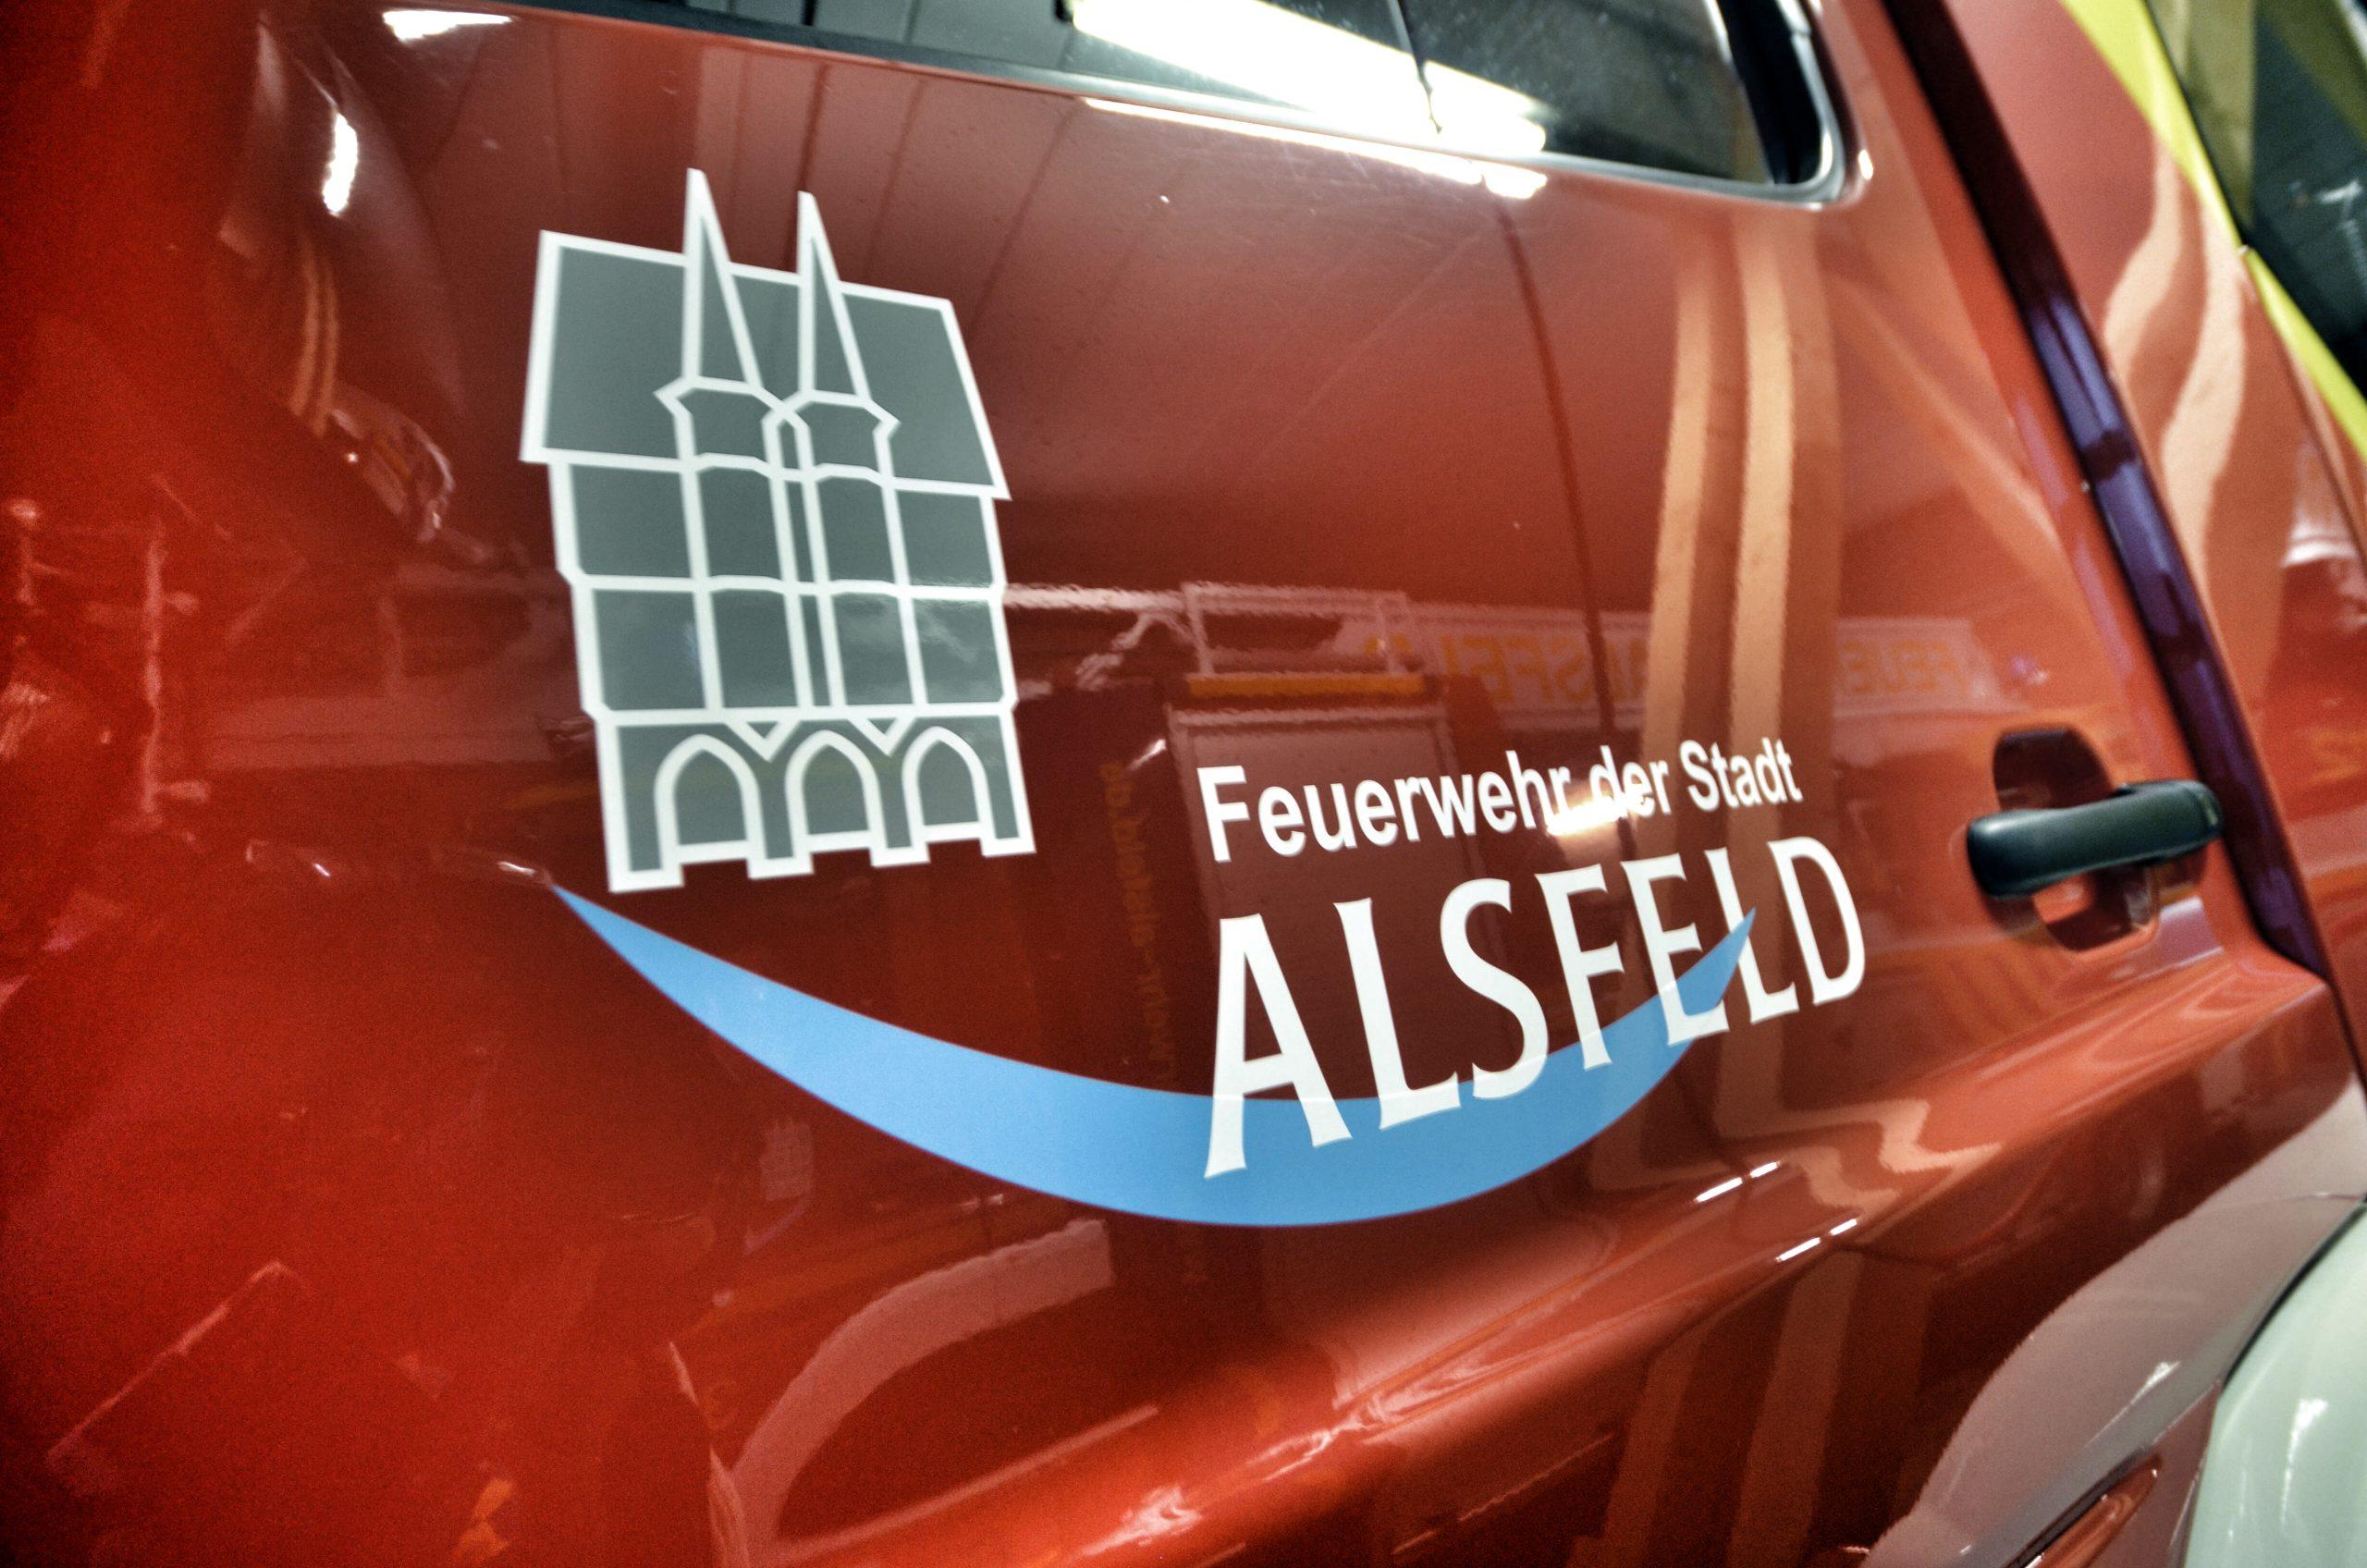 Symbolbild: Feuerwehr Alsfeld. Foto: jal